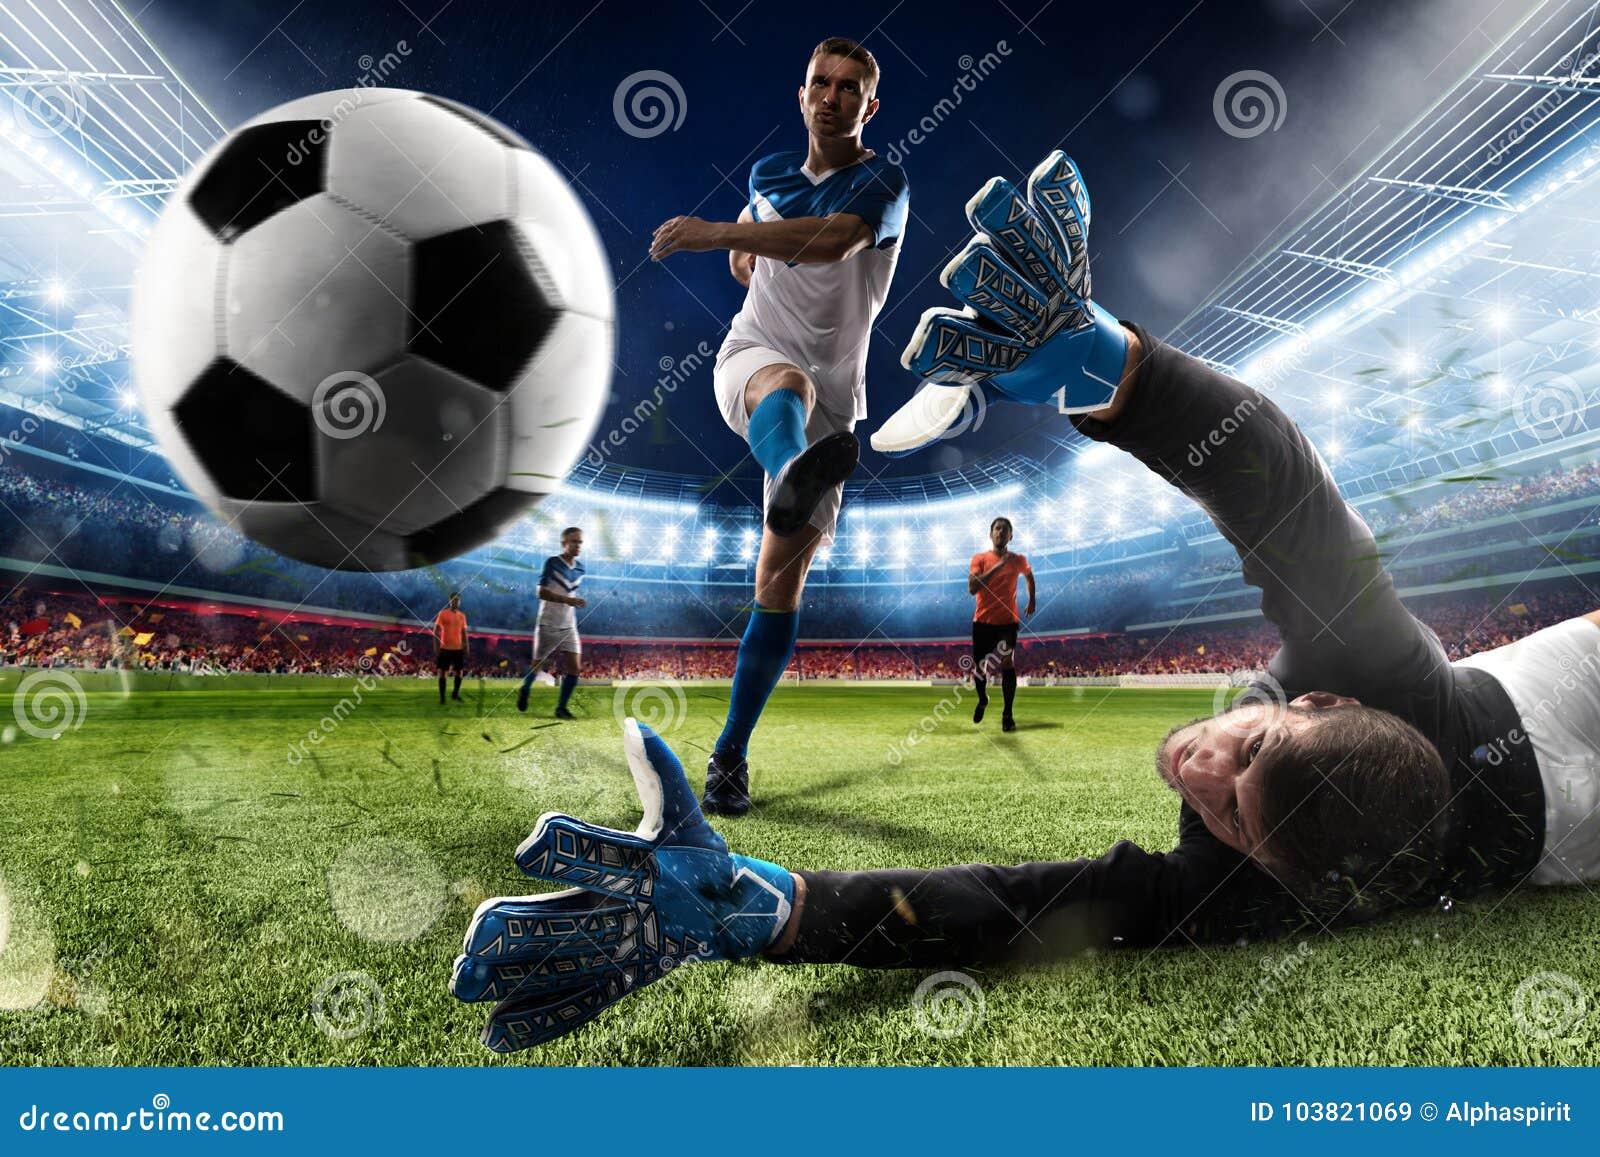 Torhüter tritt den Ball im Stadion